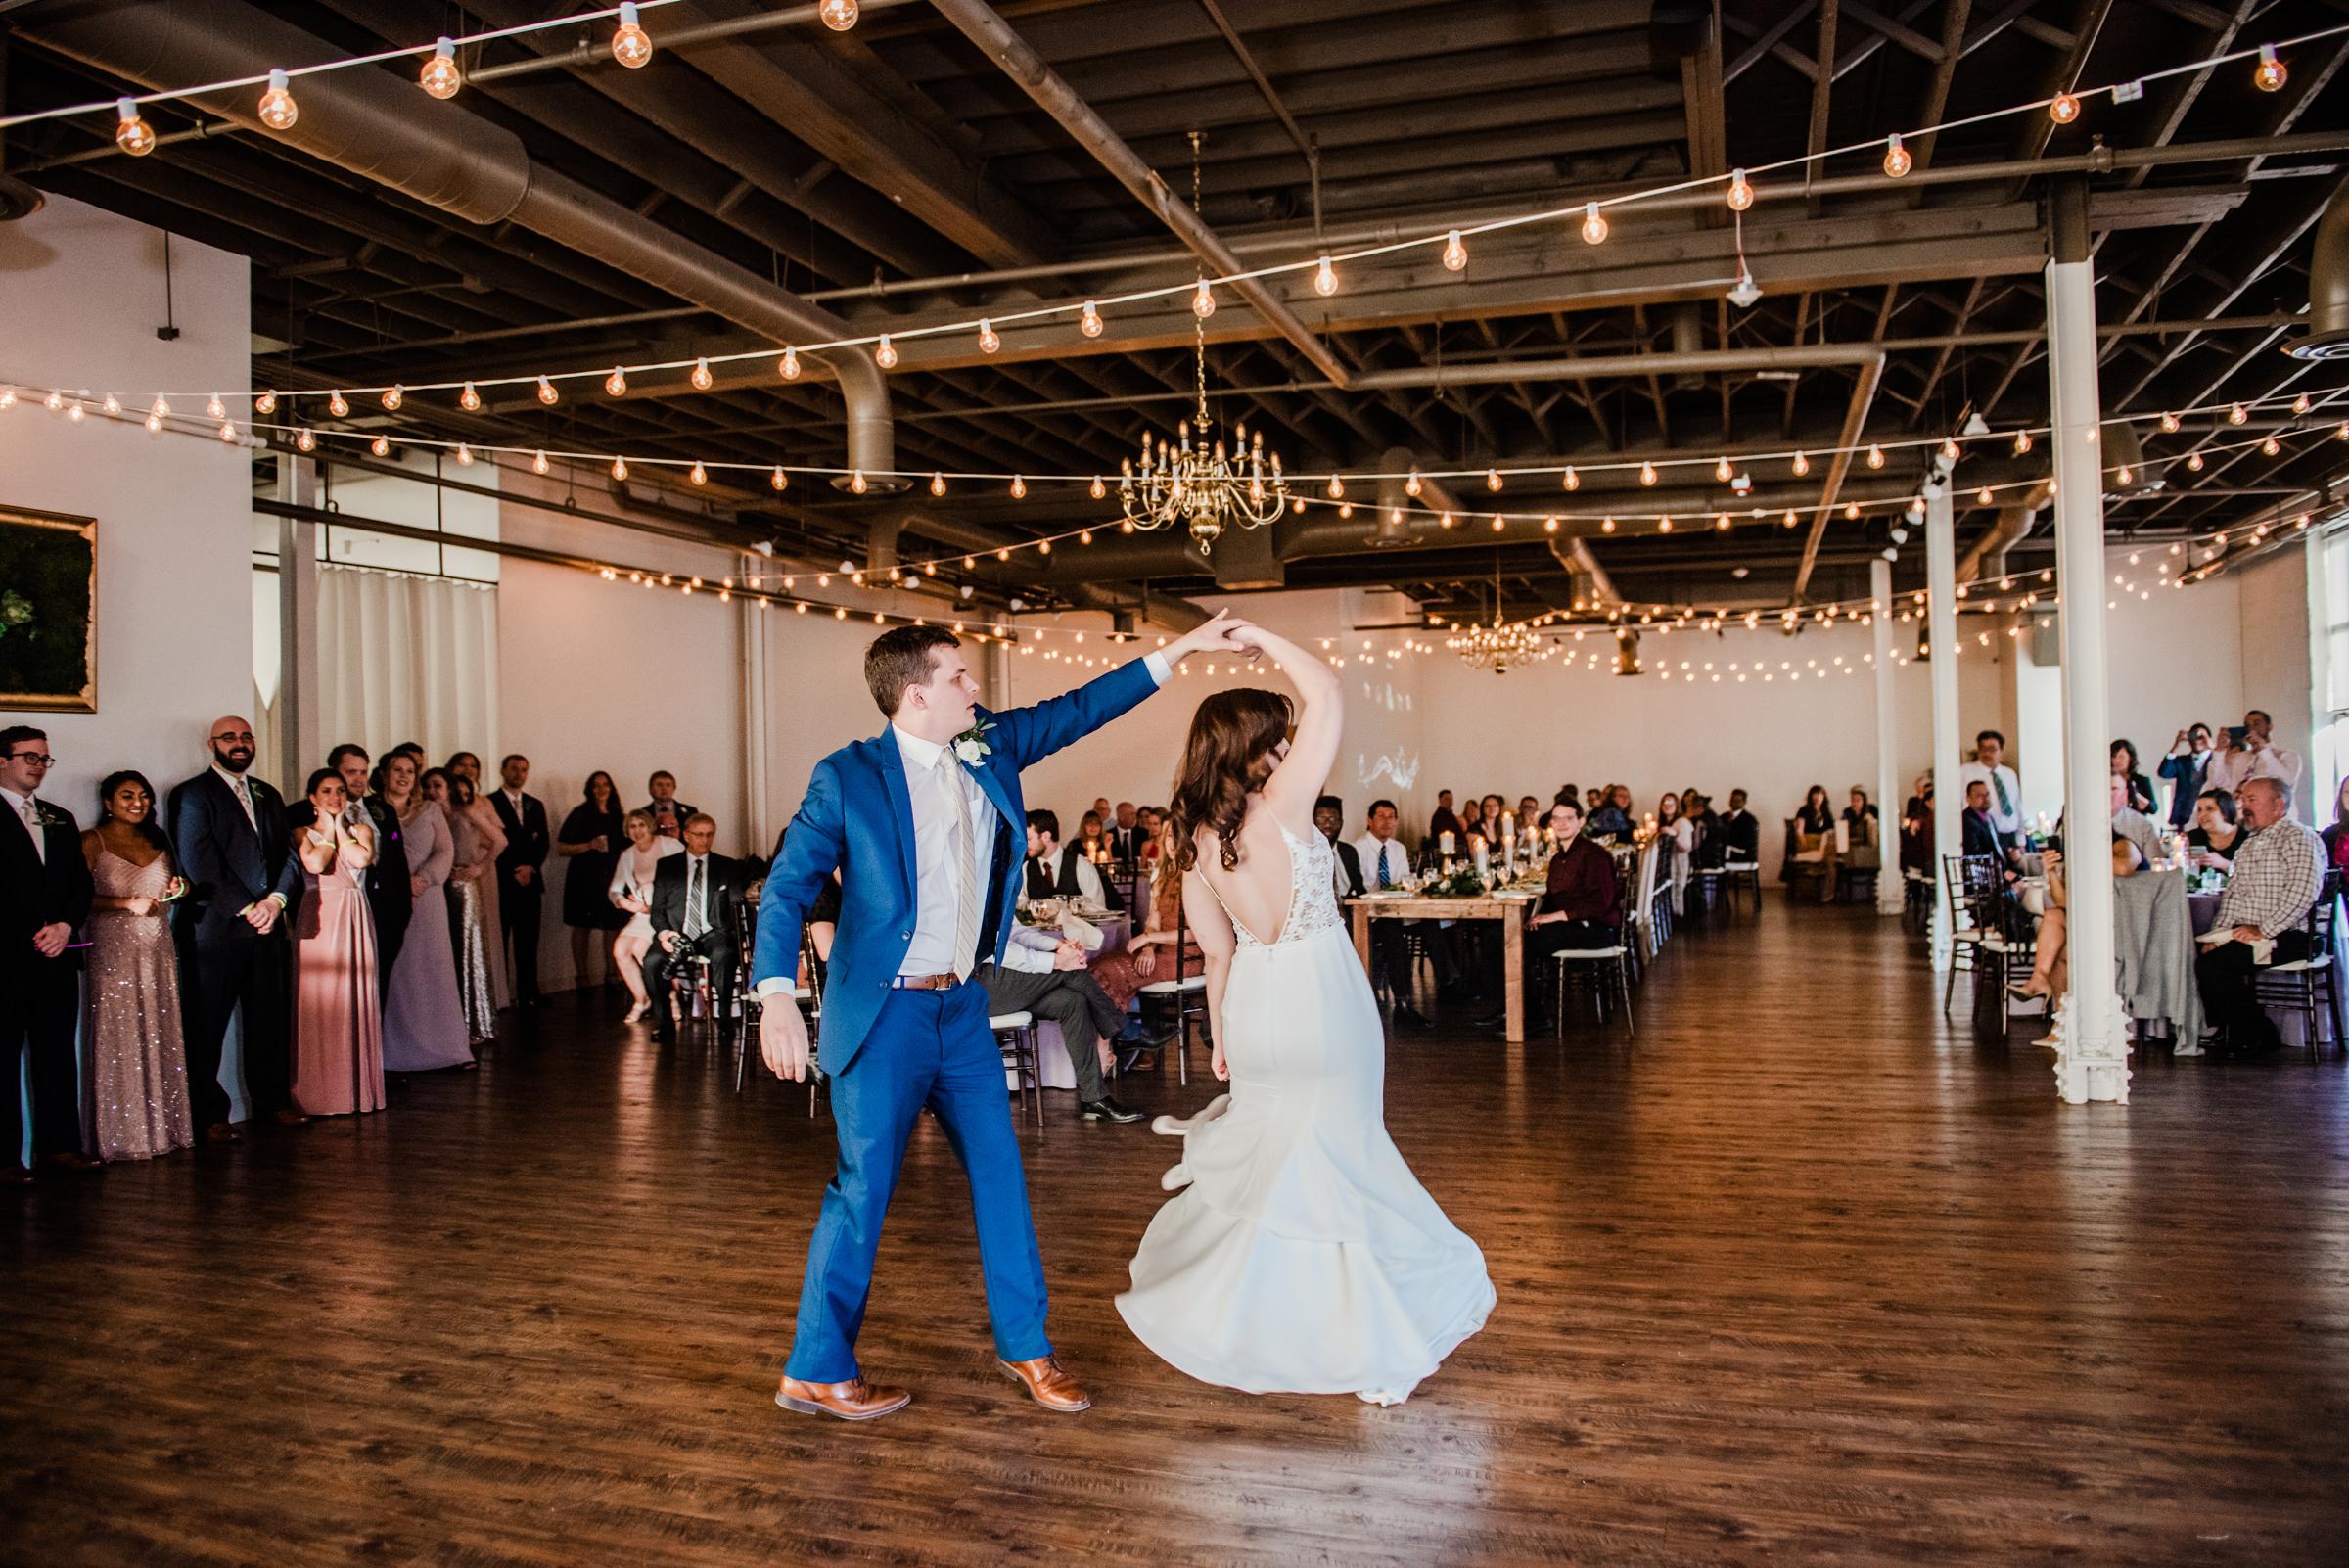 The_Arbor_LoftRochester_Wedding_JILL_STUDIO_Rochester_NY_Photographer_185227.jpg